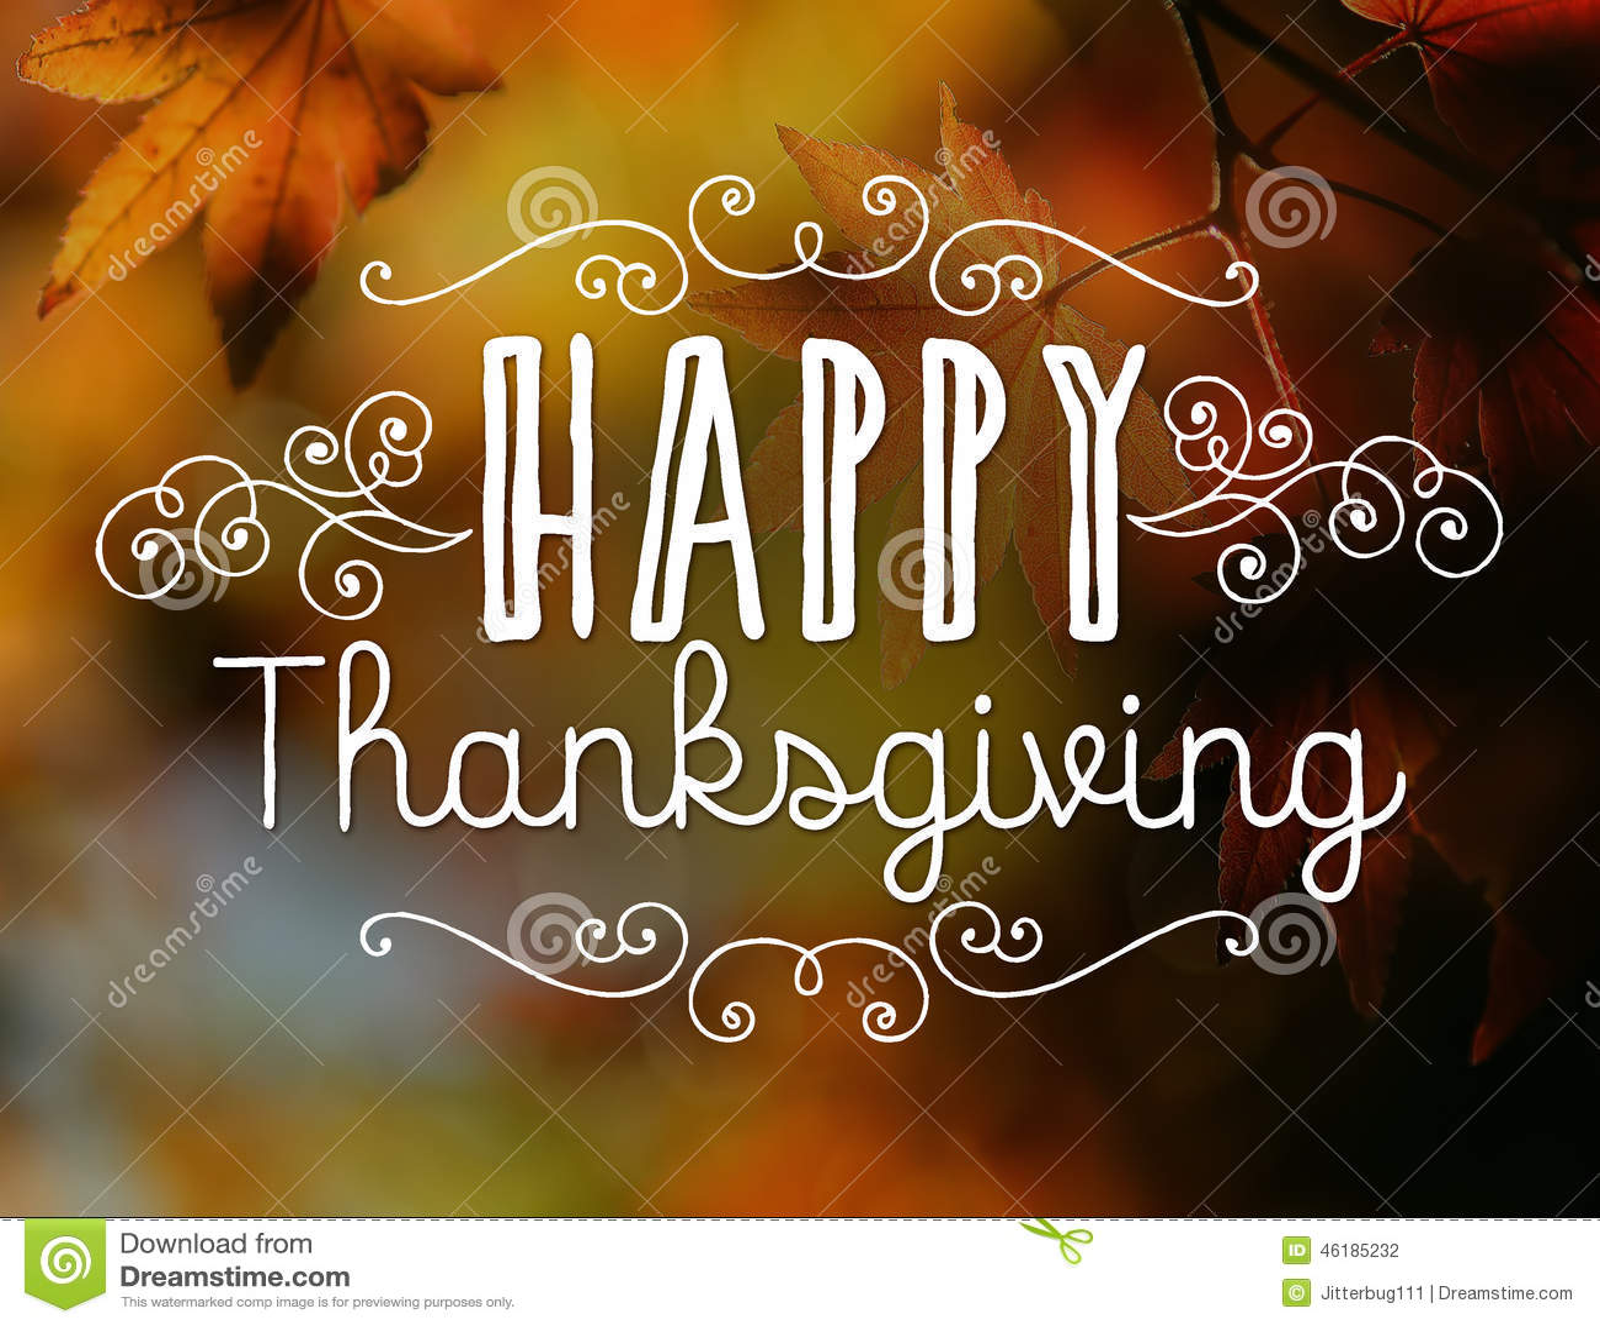 Pumpkins And Fall Leaves Wallpaper Happy Thanksgiving Stock Illustration Illustration Of